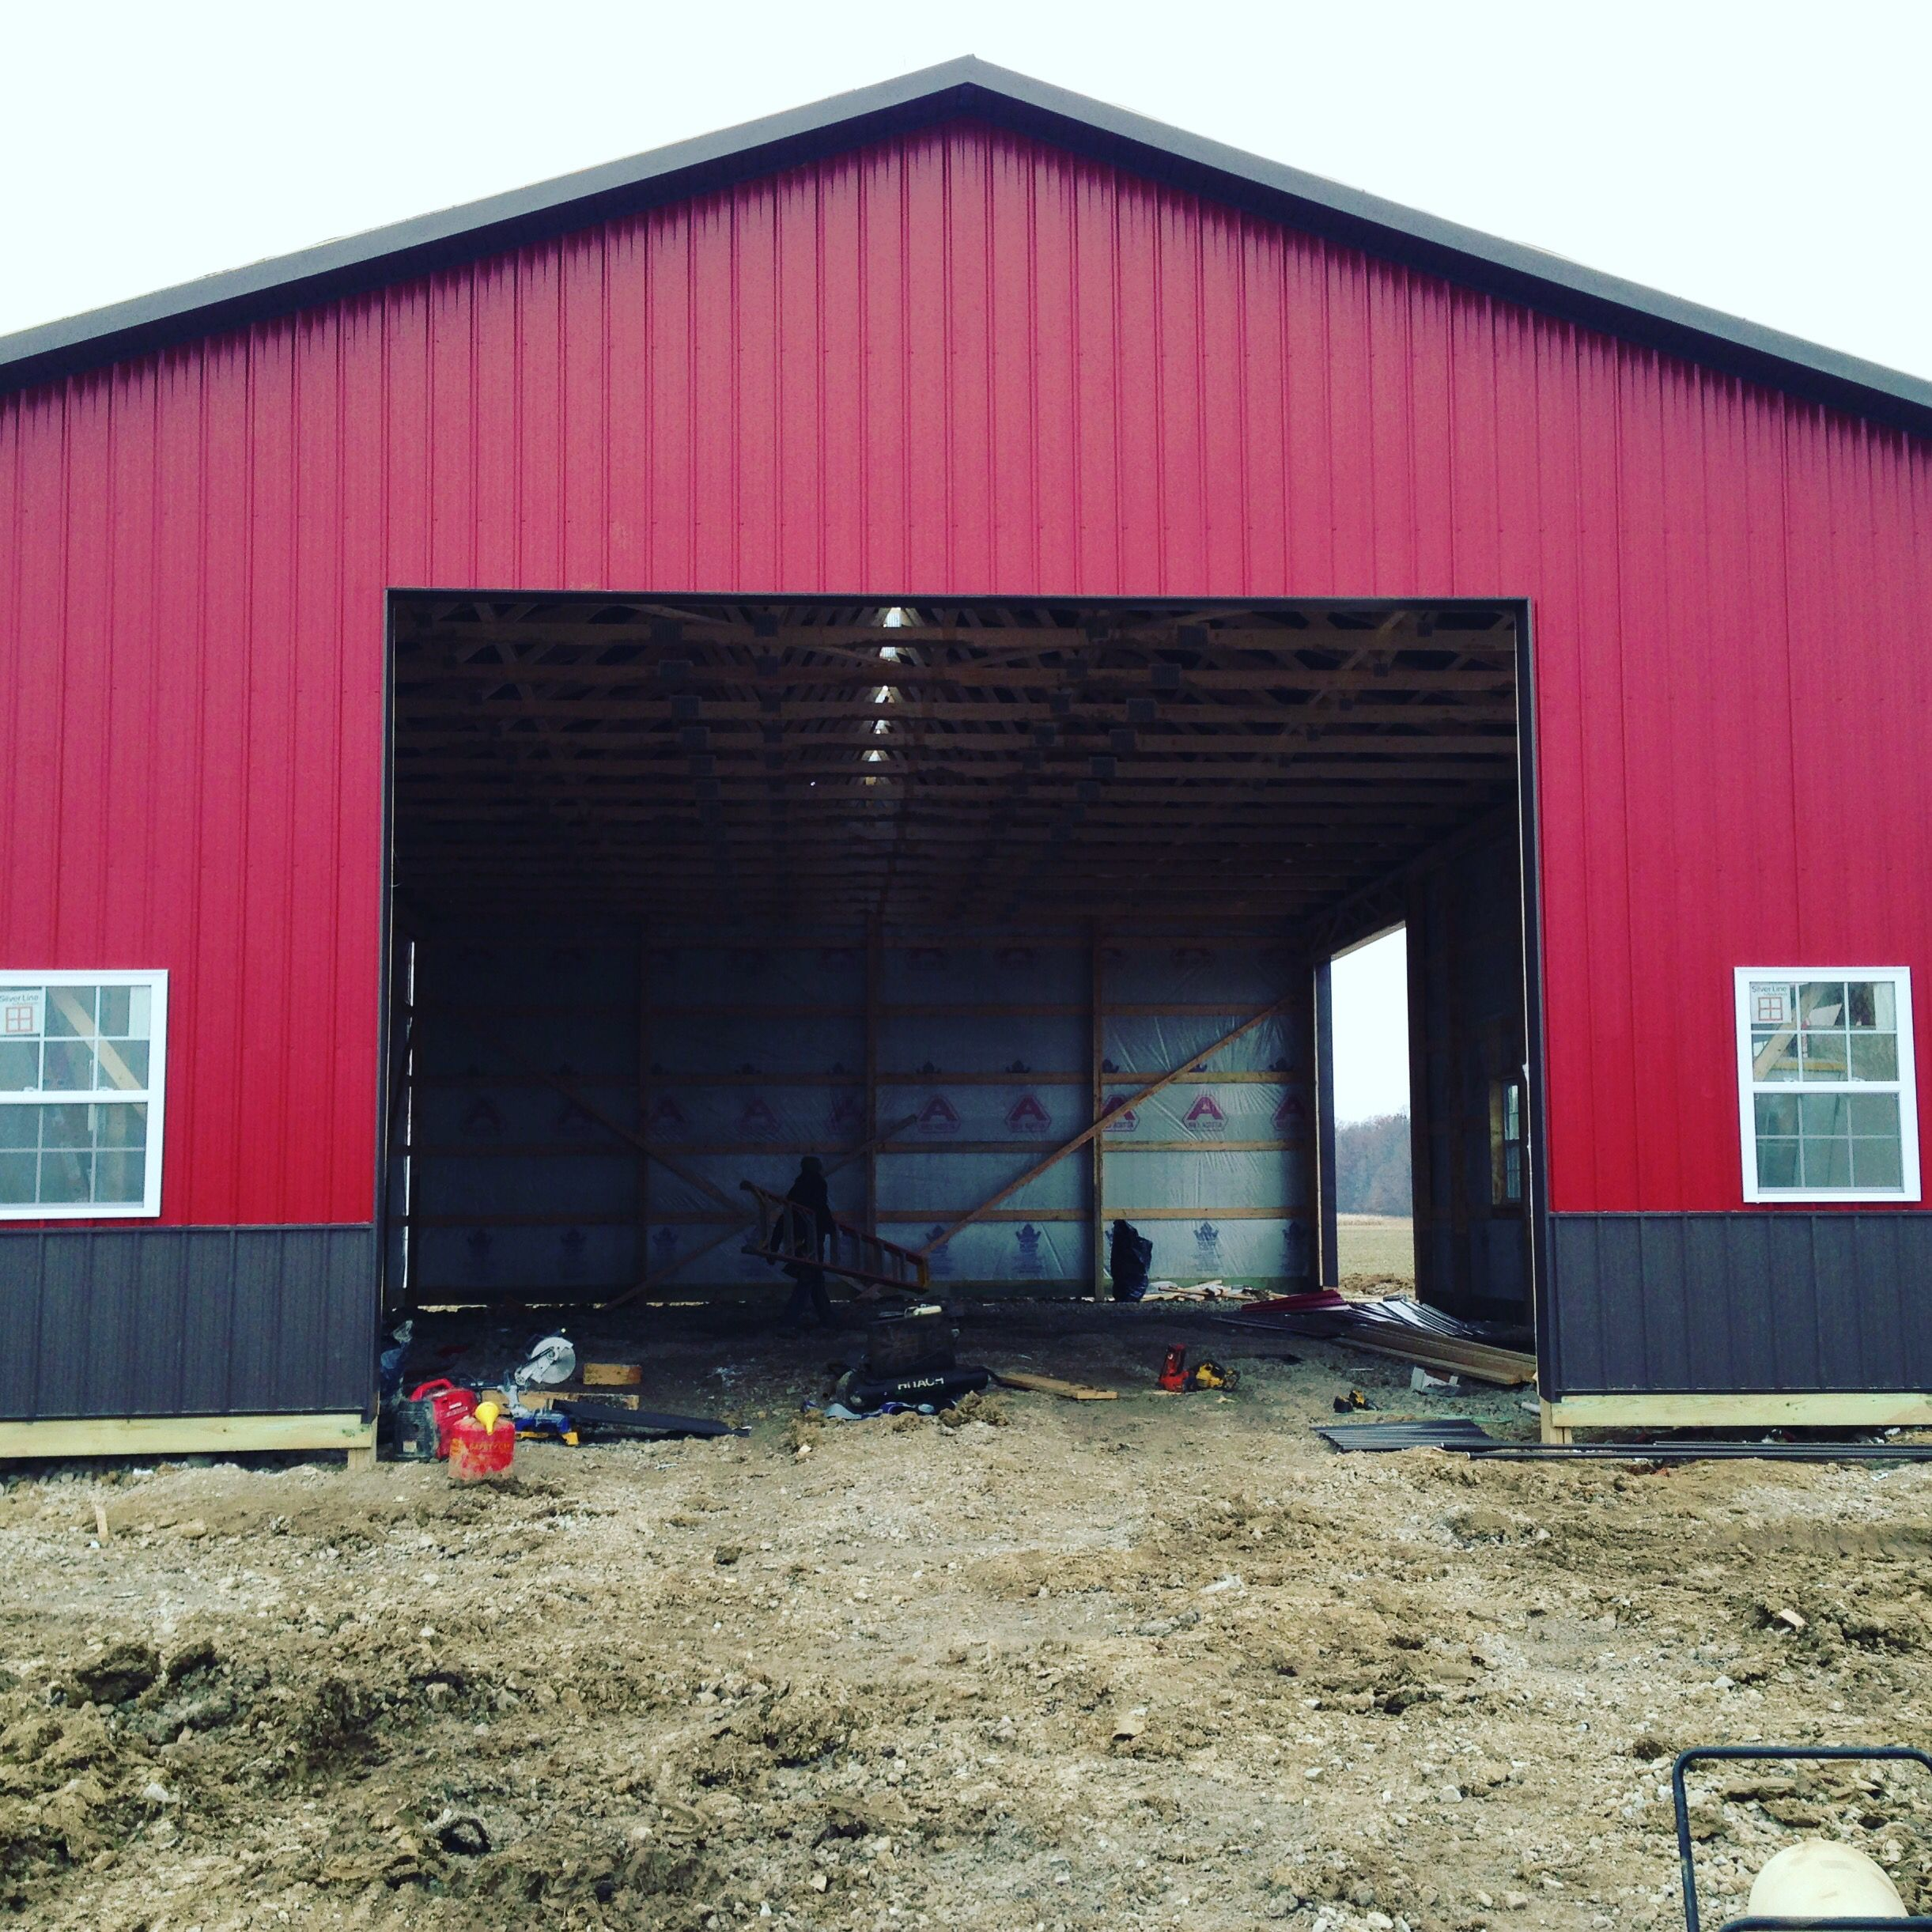 Park Art|My WordPress Blog_How To Frame A Garage Door In A Pole Barn